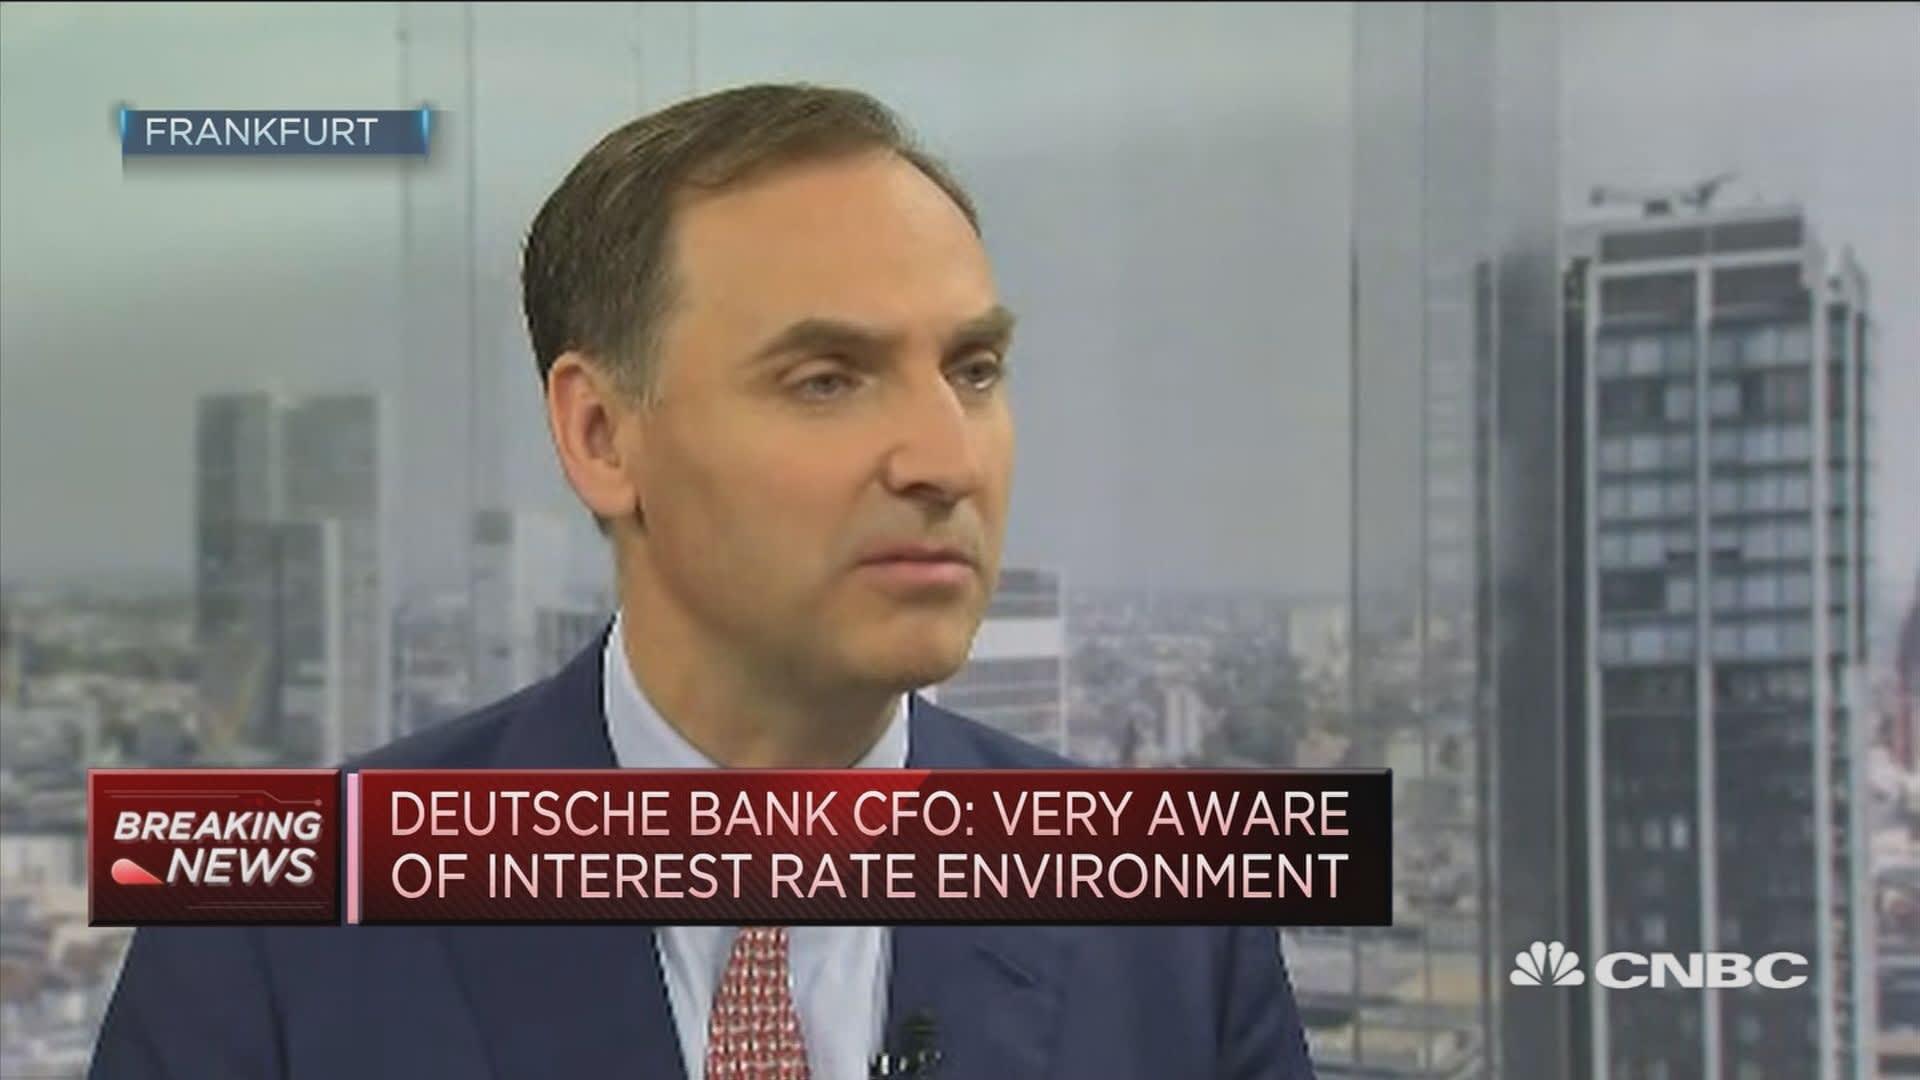 Deutsche Bank posts second-quarter net loss of 3.15 billion euros amid major overhaul